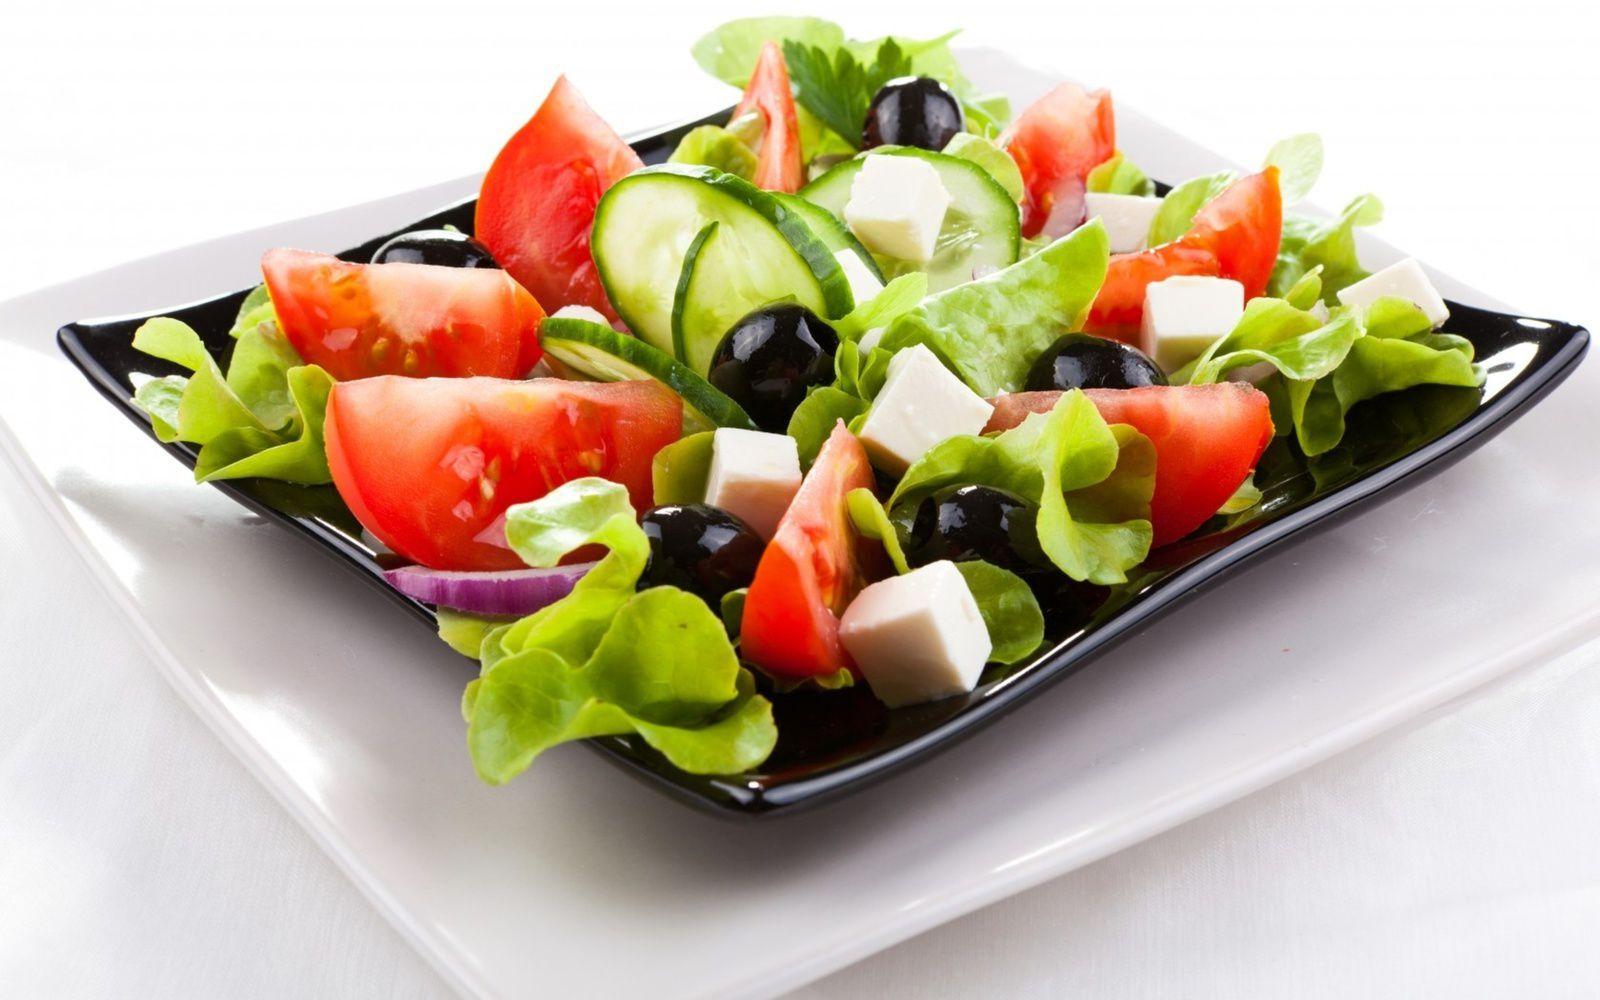 Bon appétit - Salade - Légumes - Wallpaper - Free